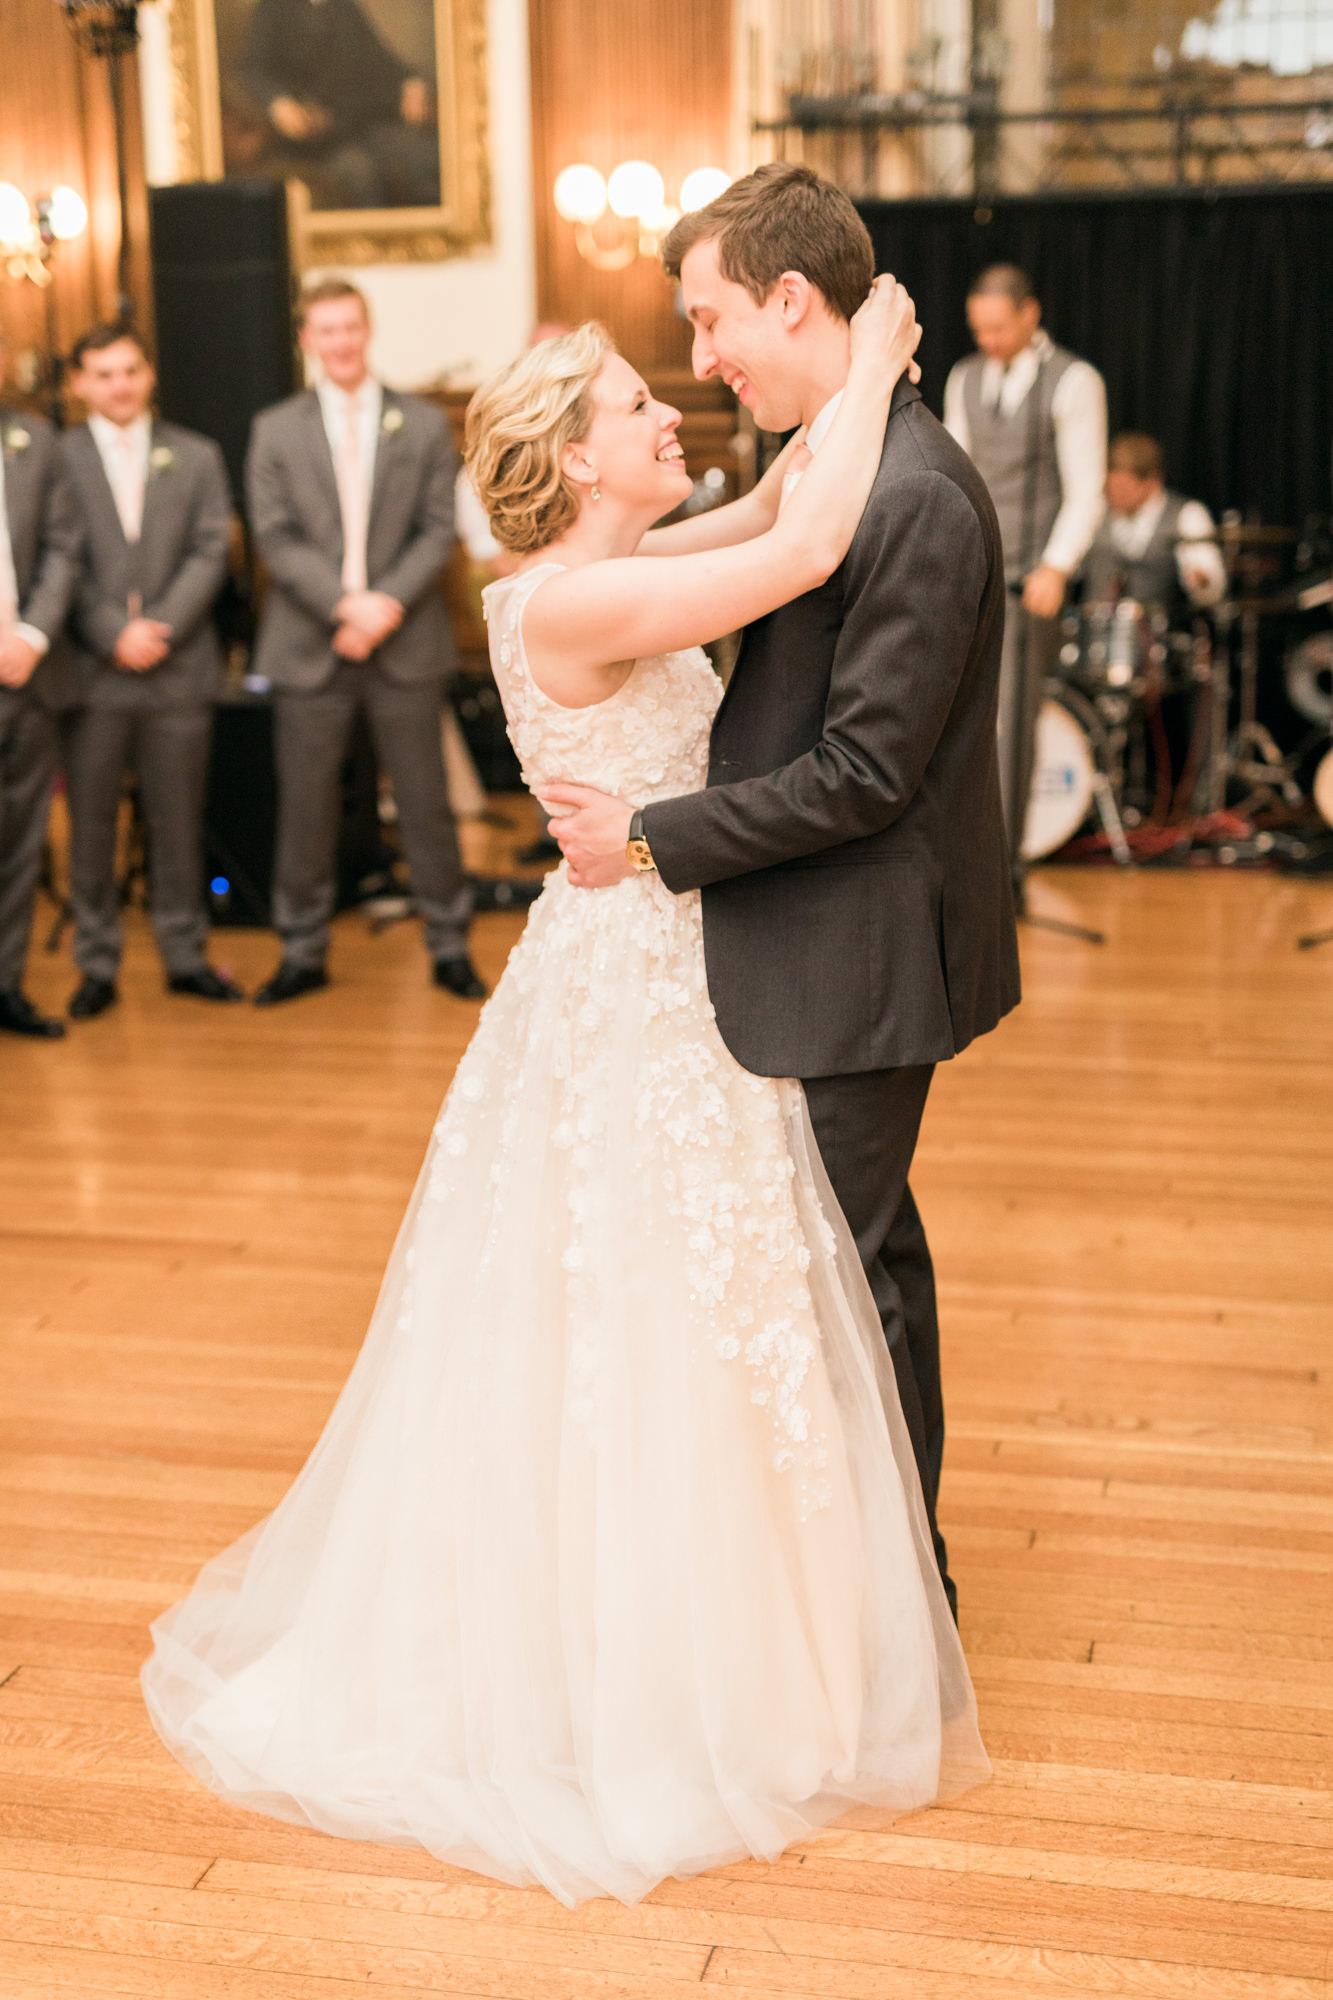 haley-richter-photography-autumn-college-of-physicians-wedding-philadelphia--312.jpg